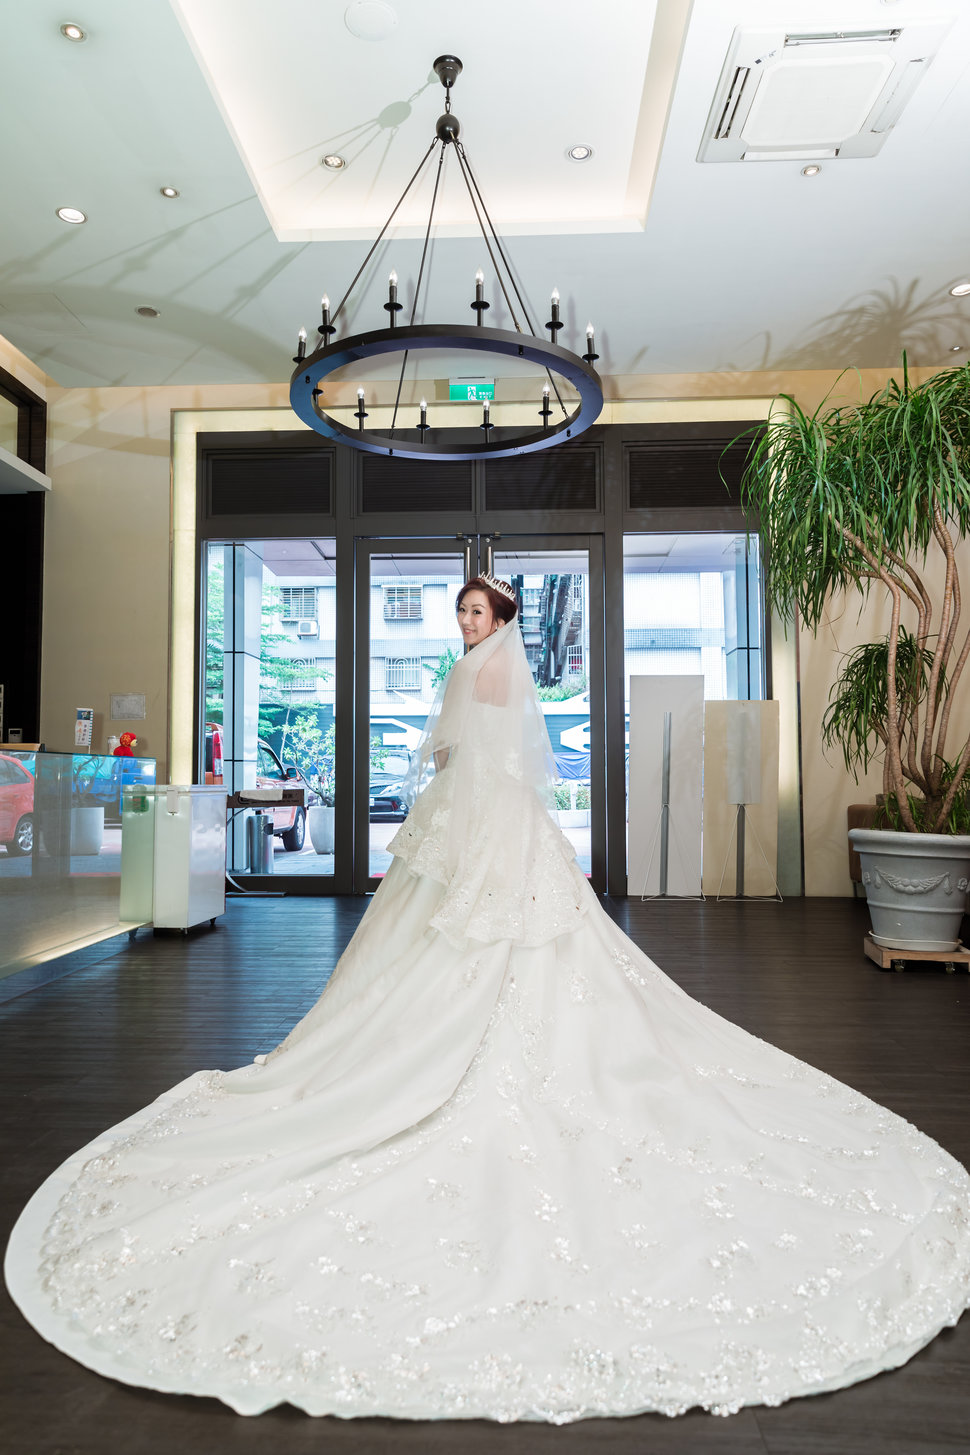 5D4_6620 - Promaker婚禮紀錄攝影團隊婚攝豪哥《結婚吧》